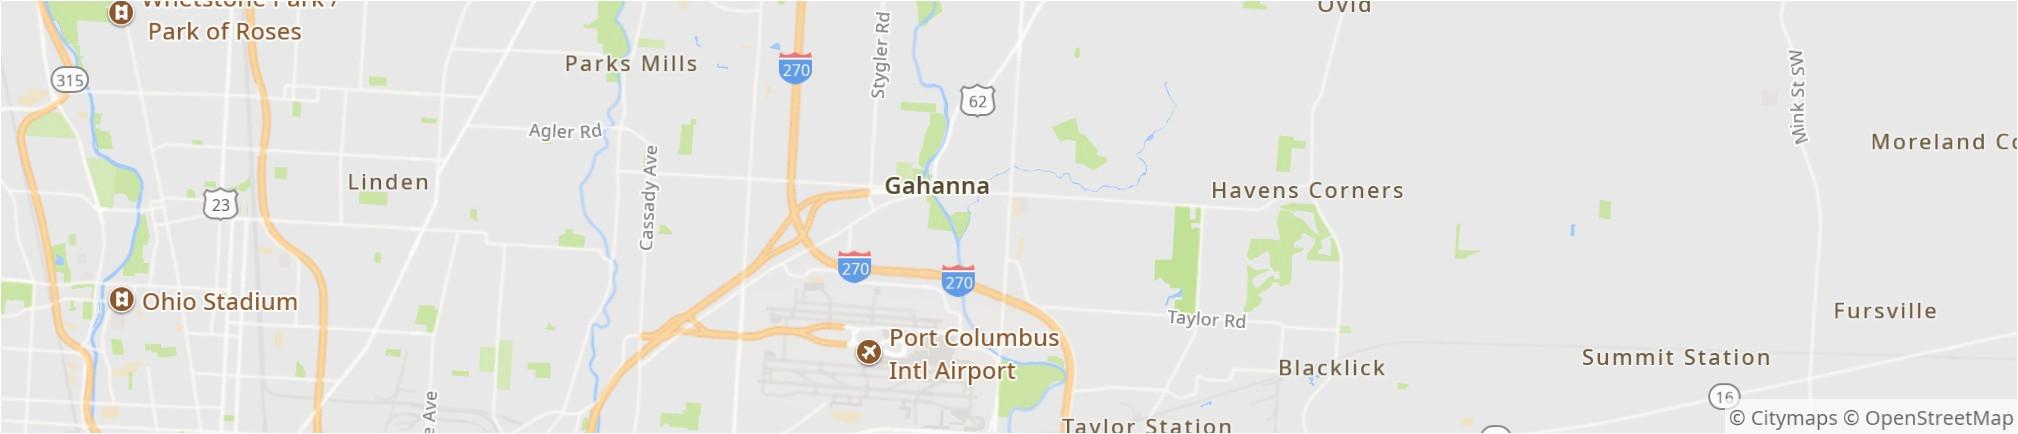 Map Of Gahanna Ohio Gahanna 2019 Best Of Gahanna Oh tourism Tripadvisor